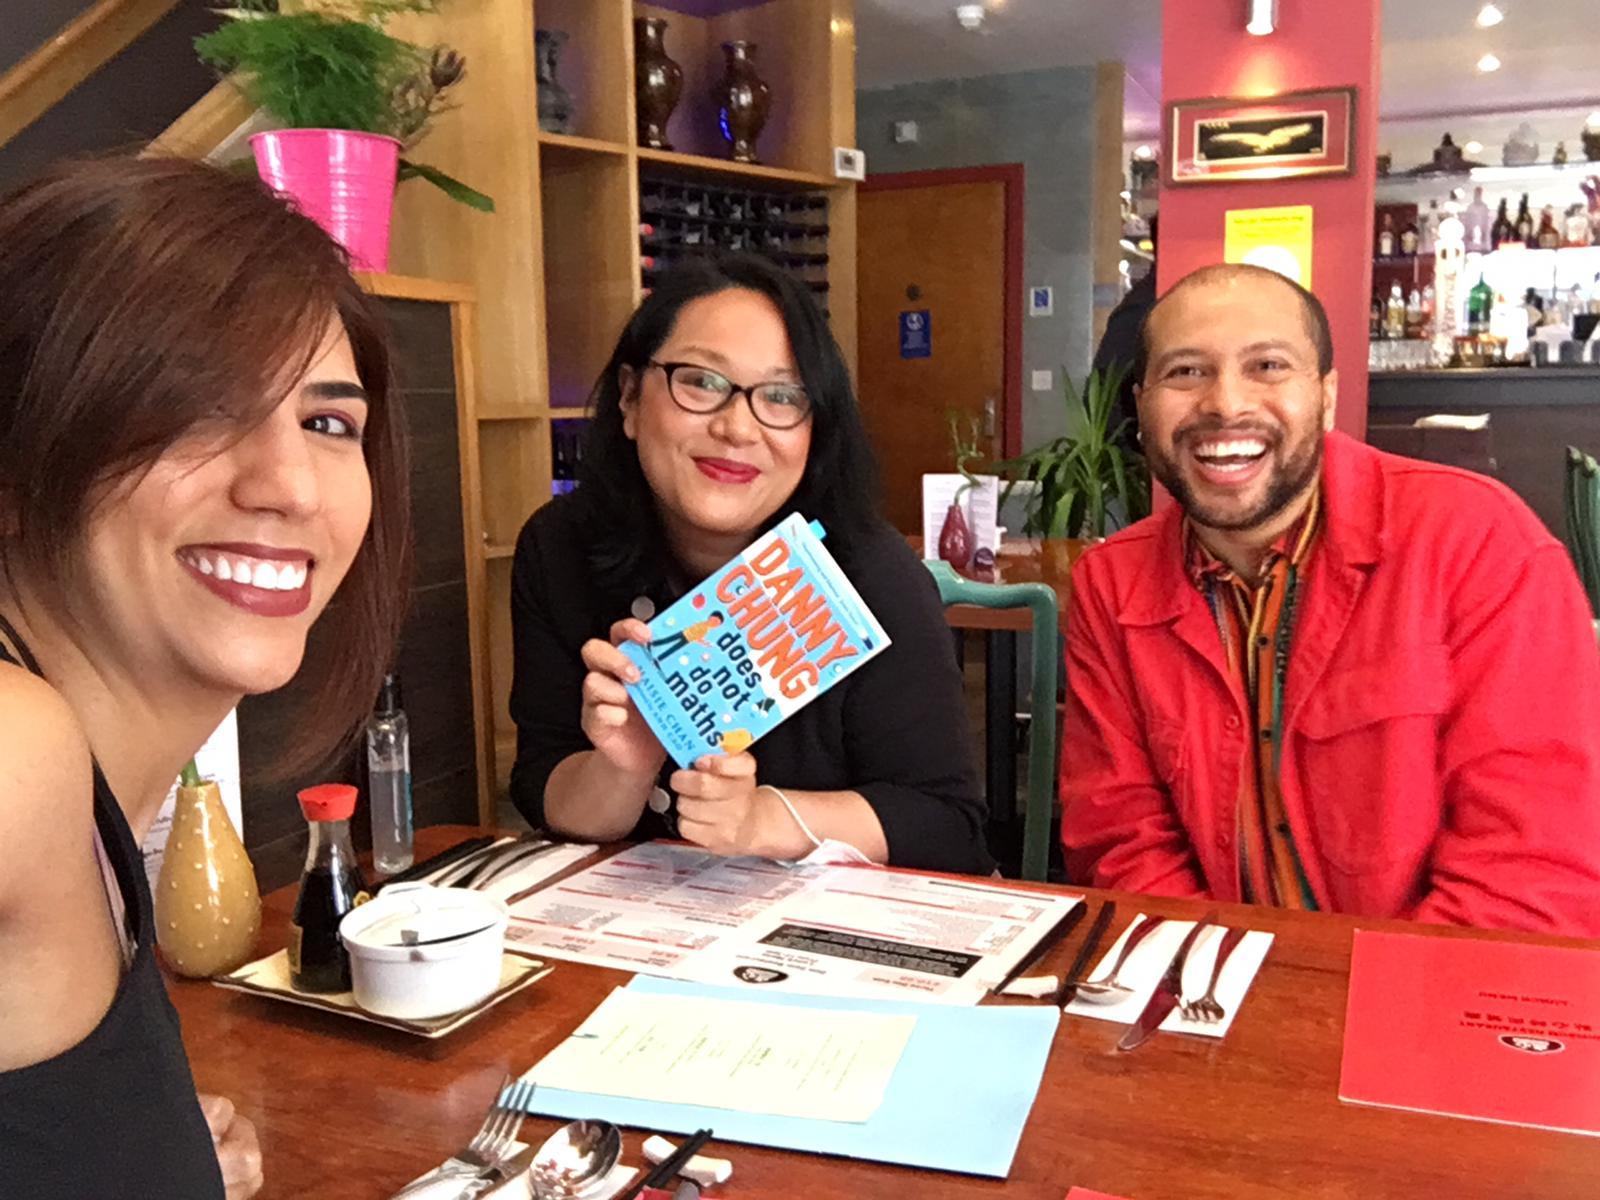 Danny Chung Book Launch Dim Sum with Dean Atta (The Black Flamingo) and Tita Berredo (Society of Authors, SCBWI Glasgow)